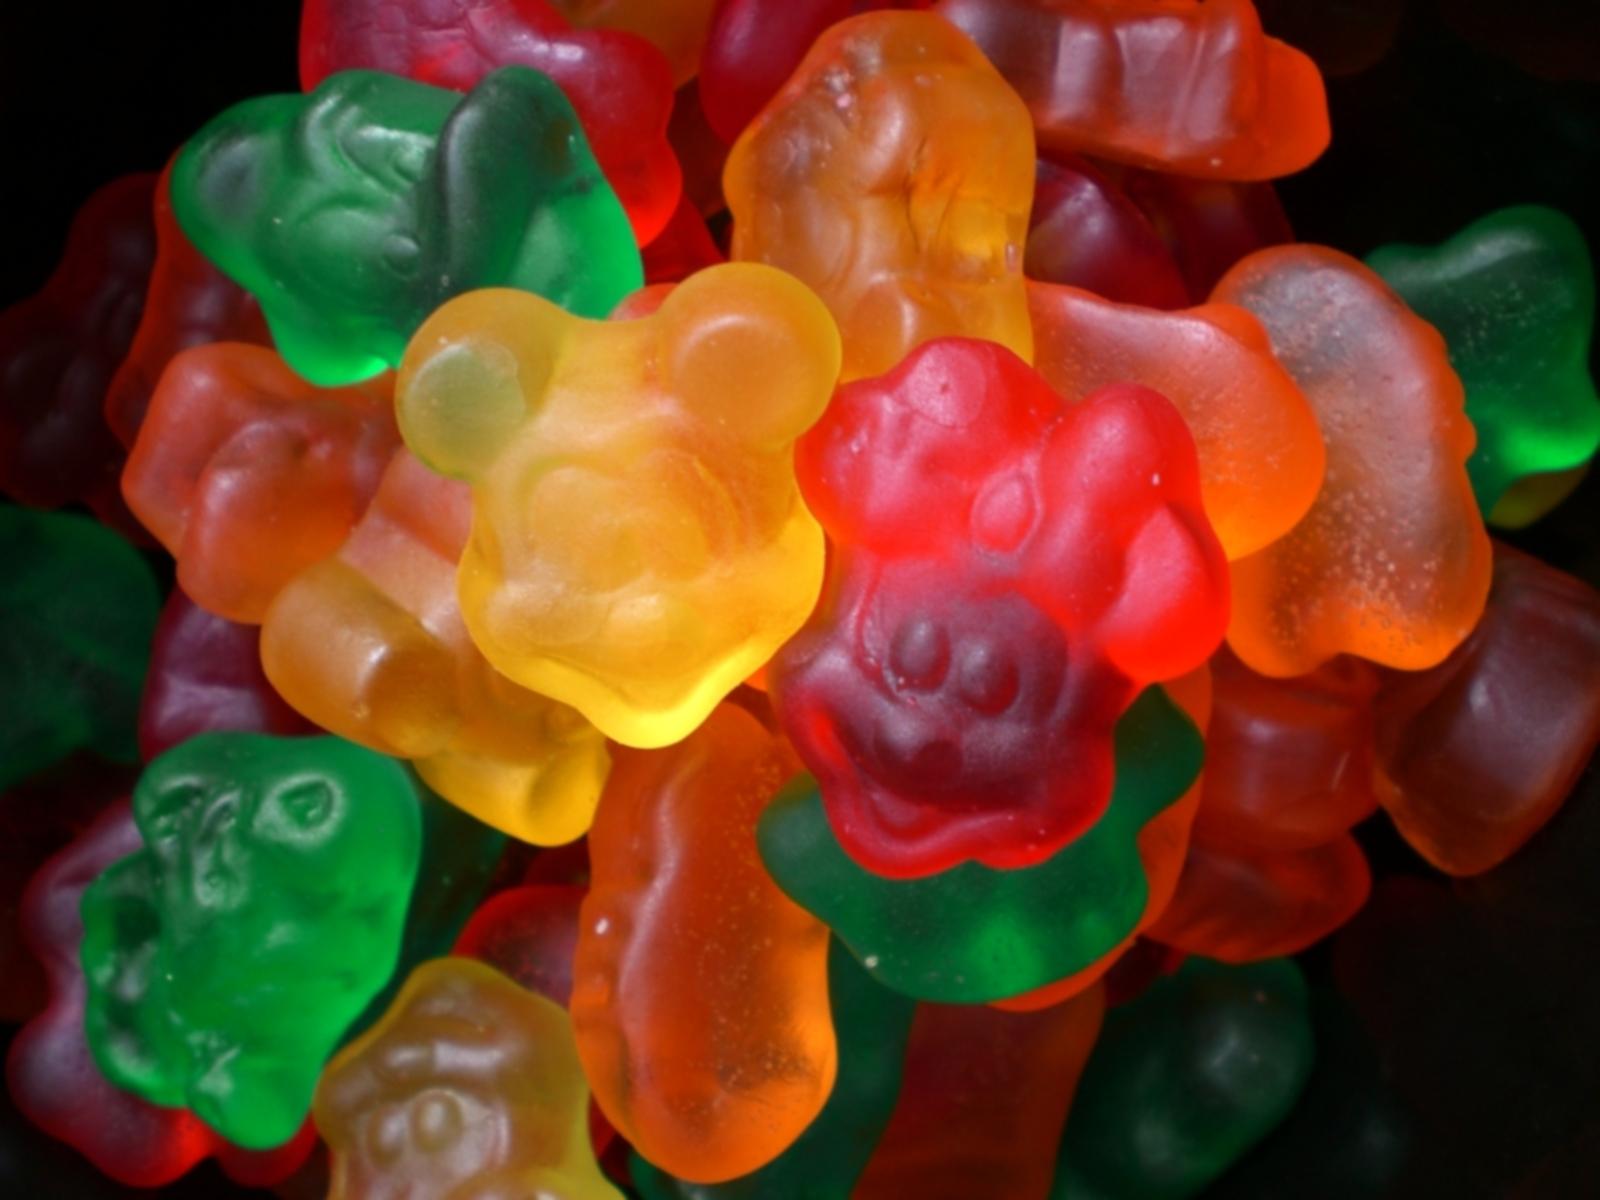 Gummickey, Bspo06, Candy, Gummy, Jelly, HQ Photo